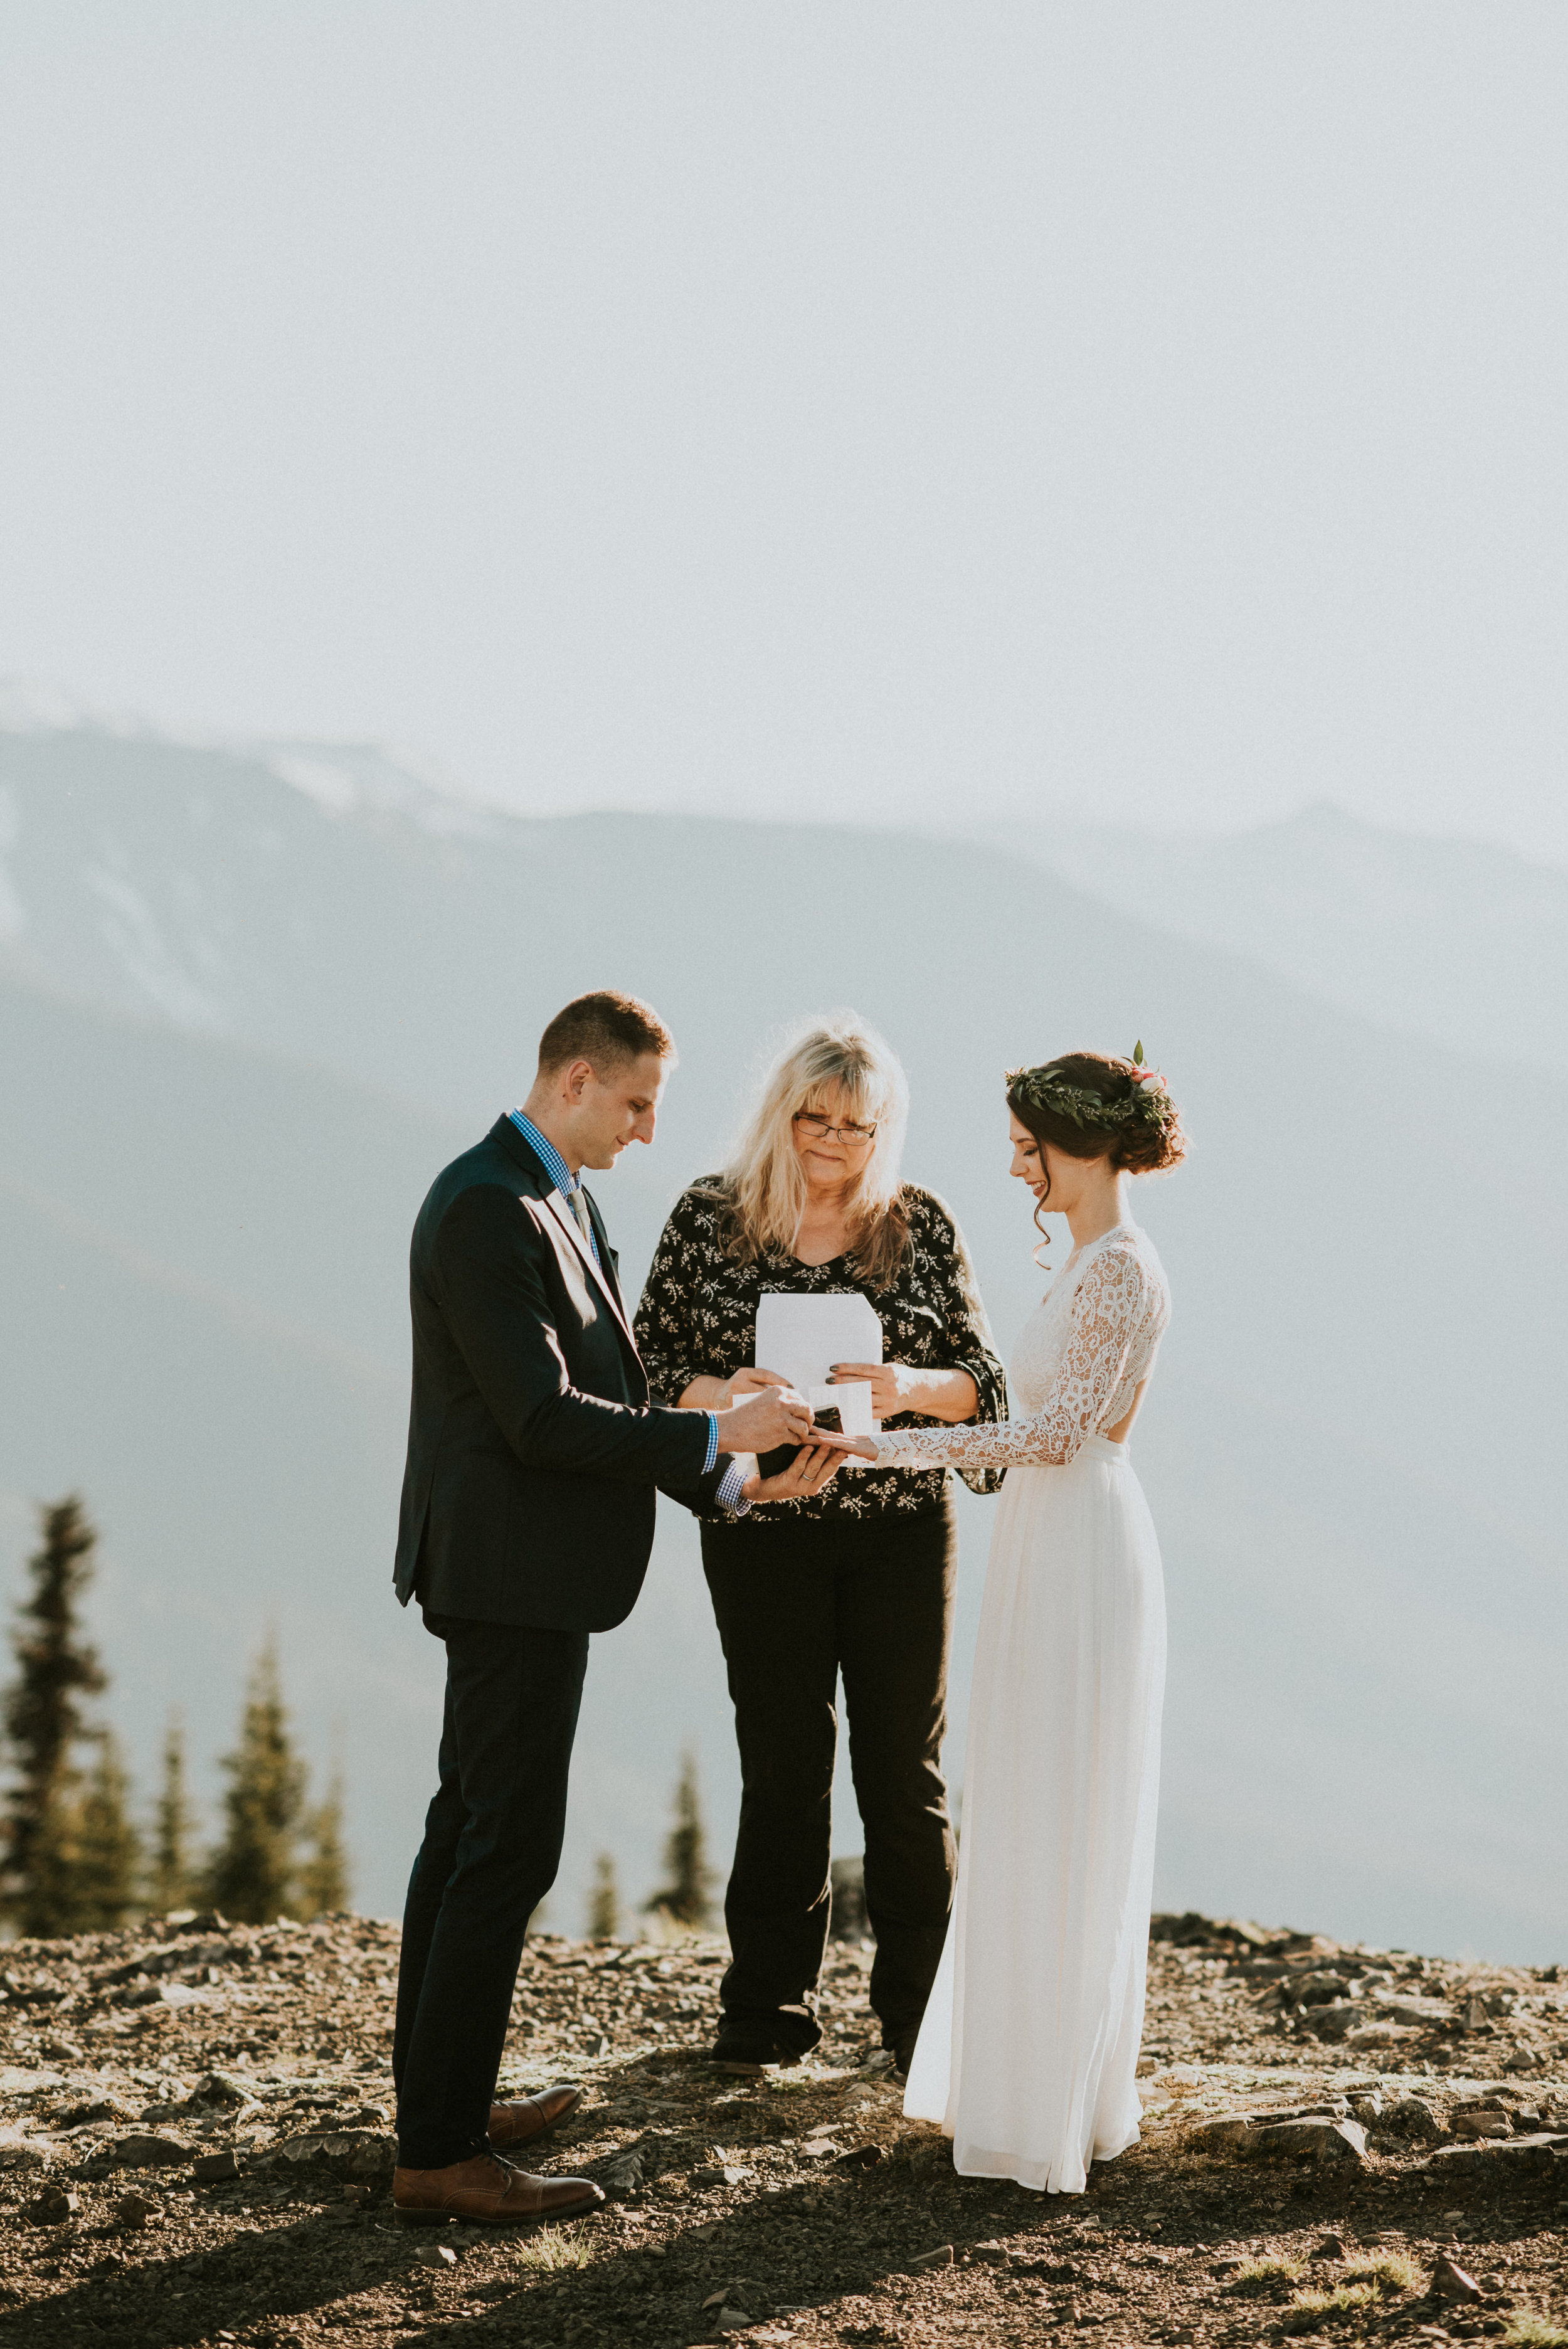 Alaina + Jared - Olympic National Park Elopement - Kamra Fuller Photography-122.jpg